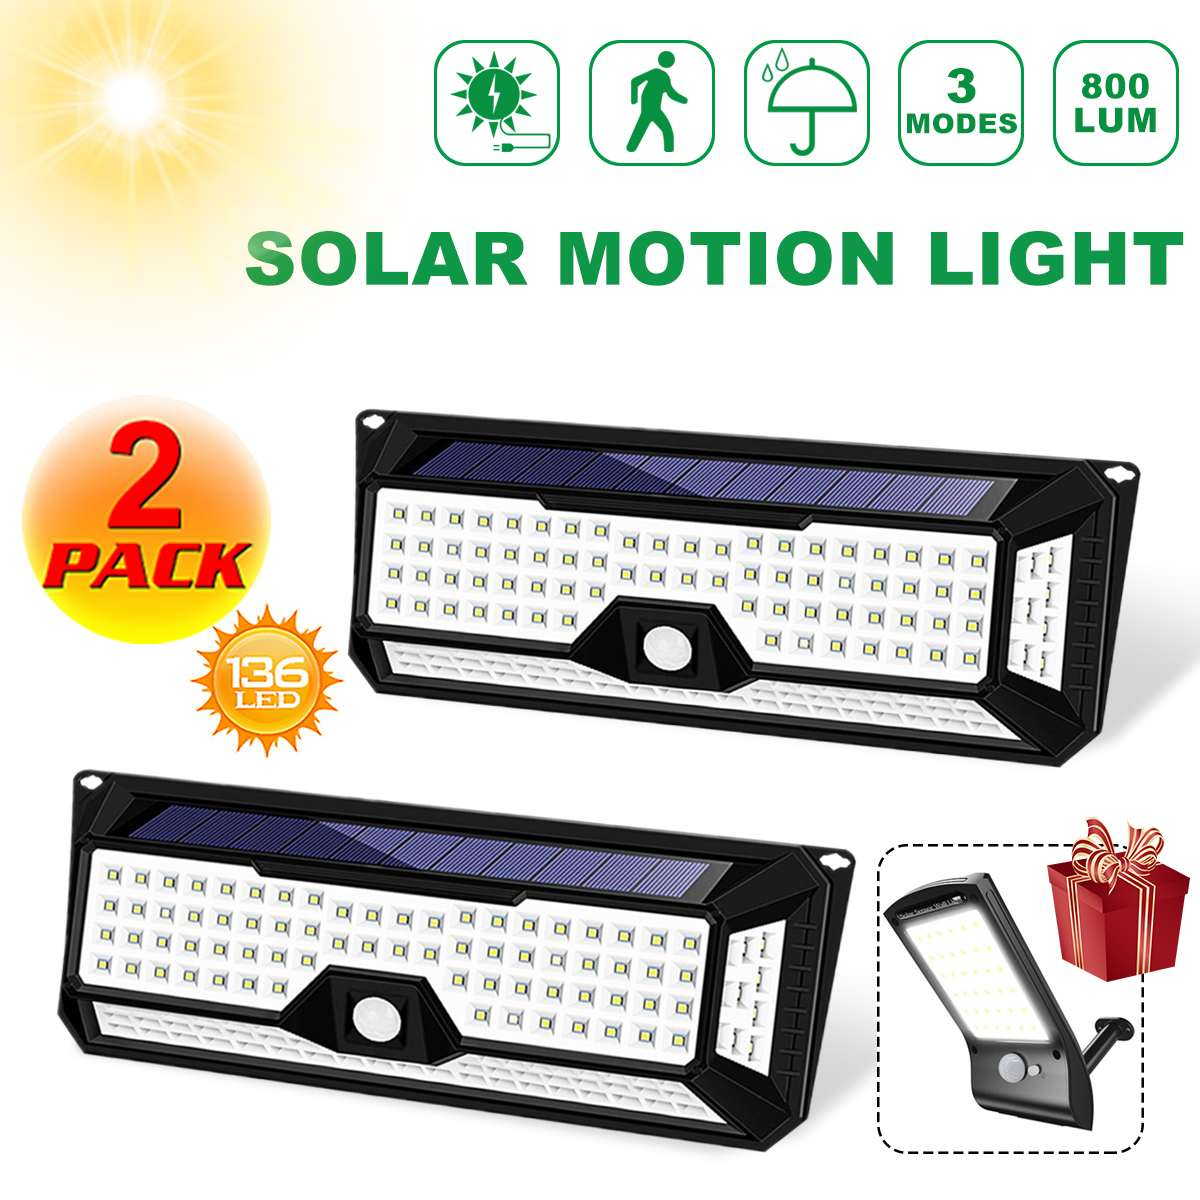 Waterproof 136 LED 1810LM Garden Solar Lights Solar LED Wall Light Outdoor 3 Modes 270 Degree Solar PIR Motion Sensor Lamps|Solar Lamps| |  - title=